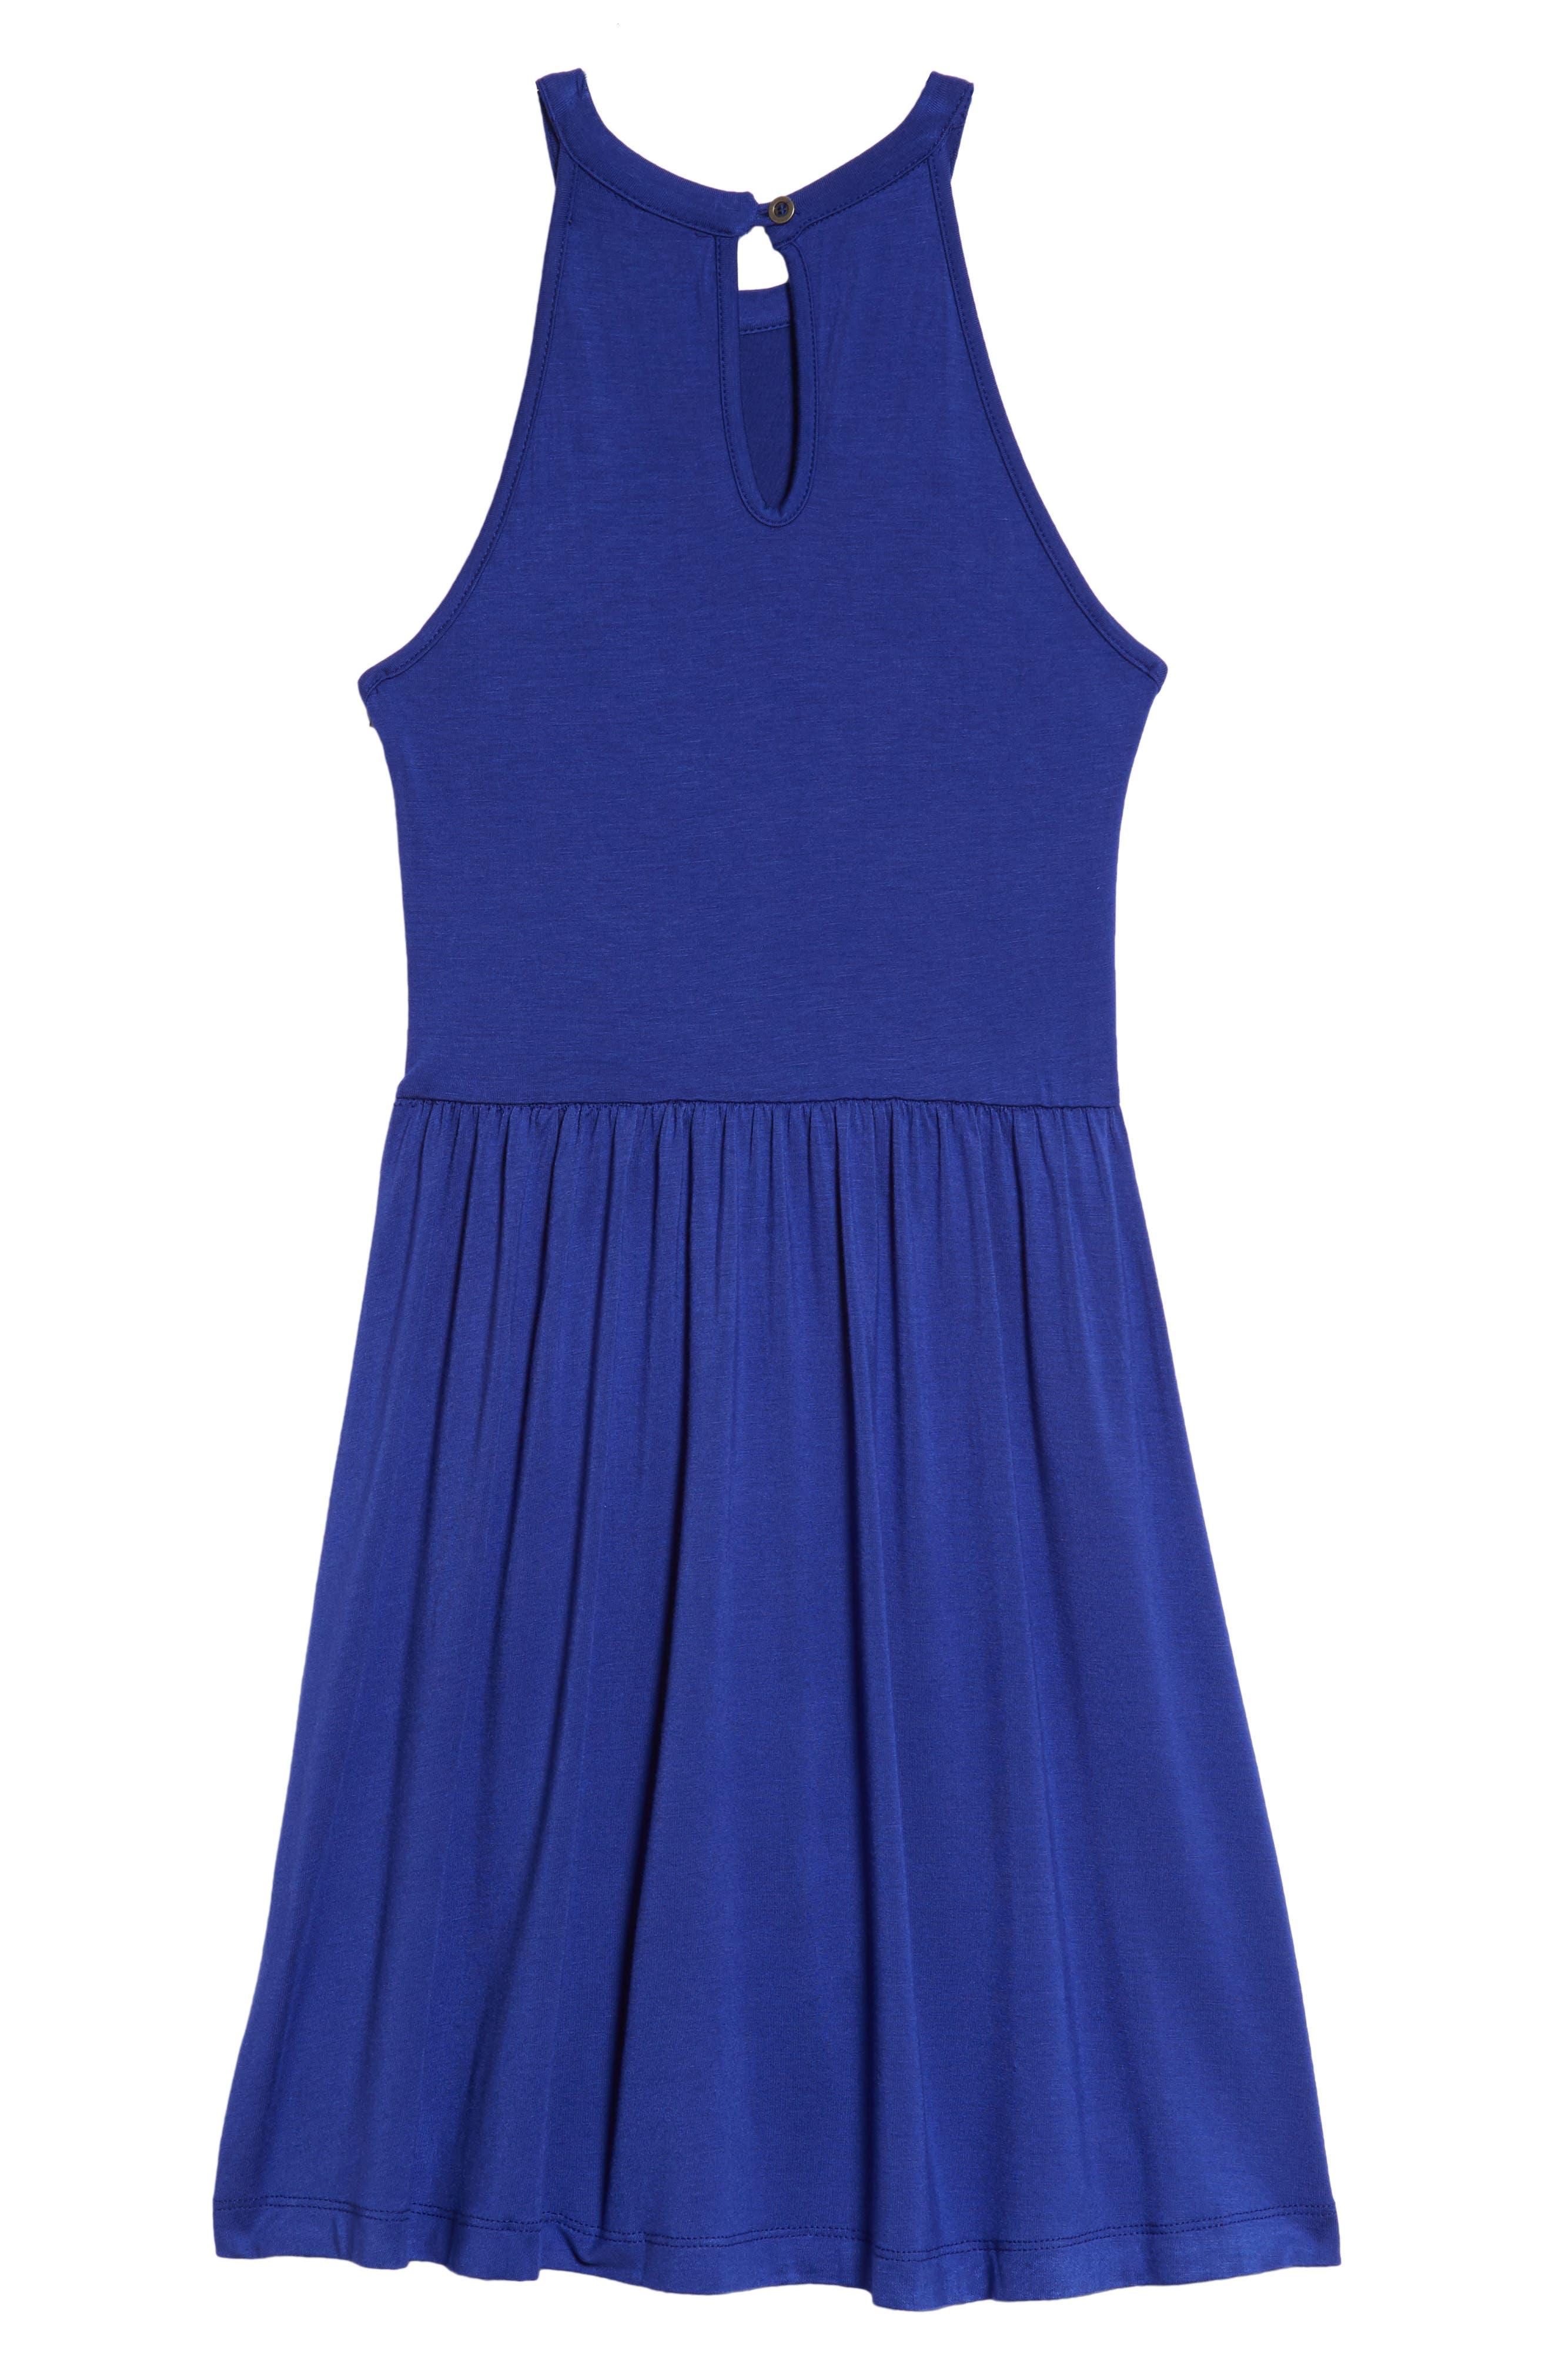 Good Luck Gem Knit Halter Cage Skater Dress,                             Alternate thumbnail 2, color,                             Royal